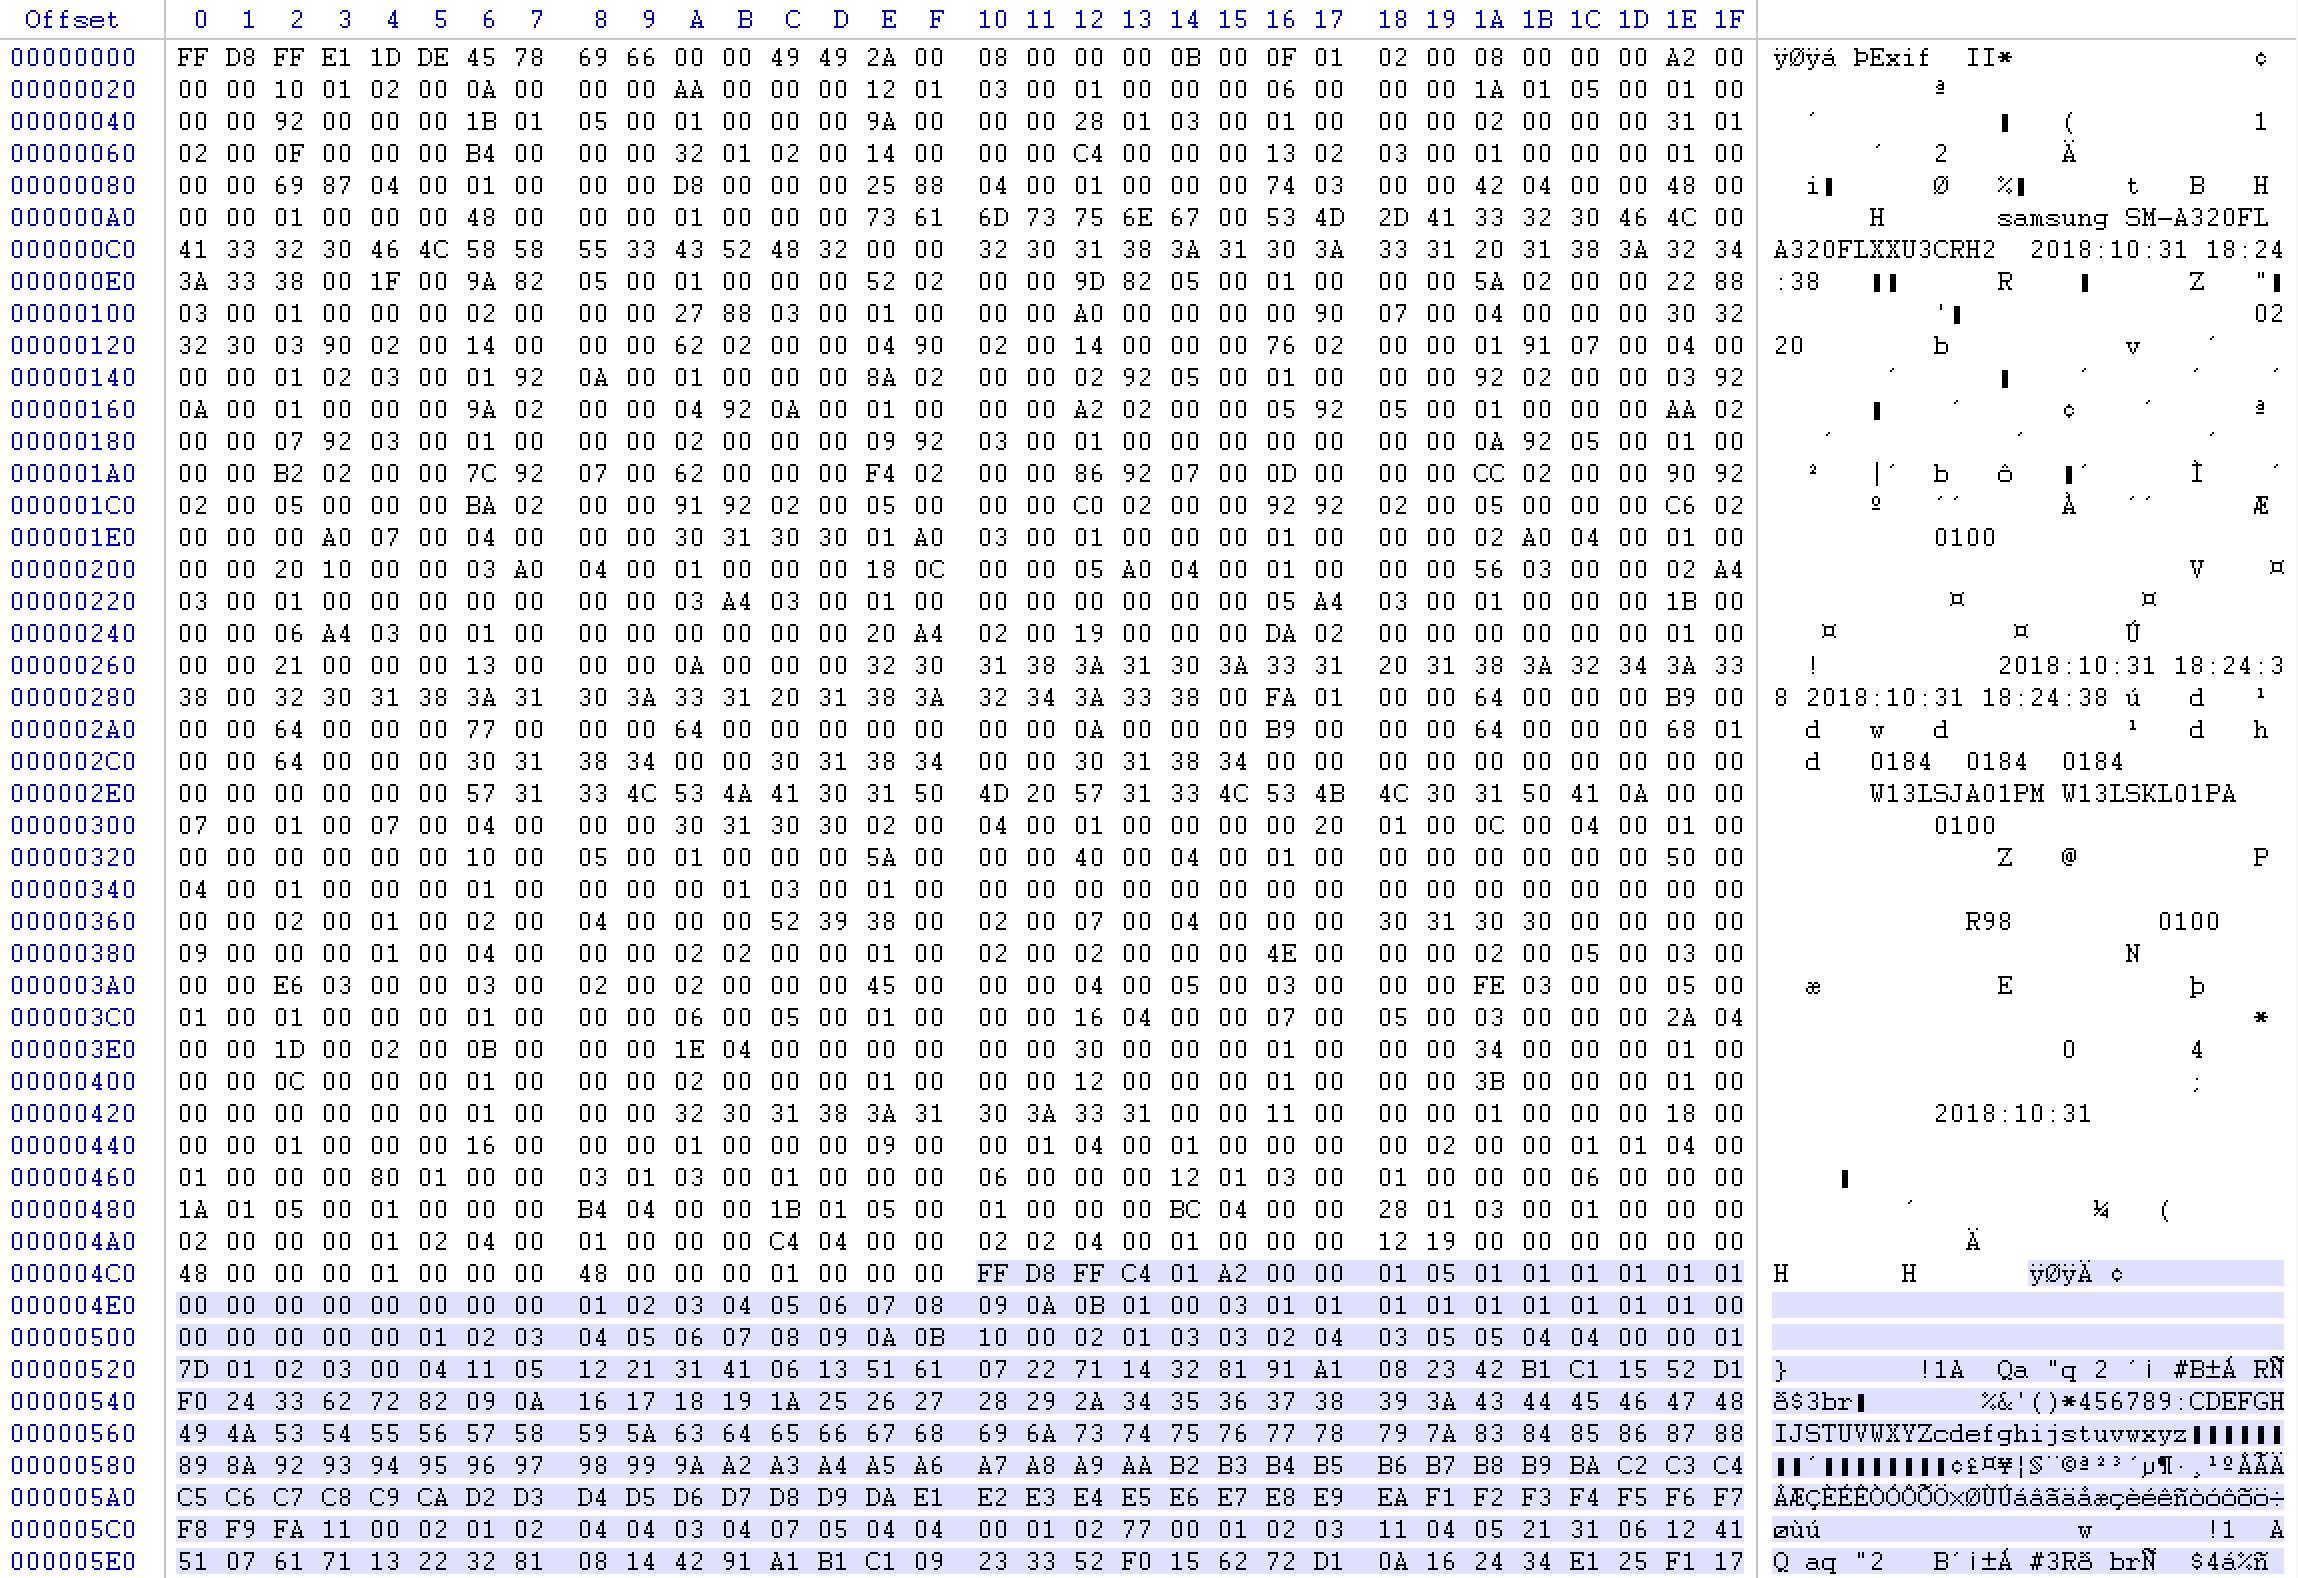 grande modifiée hexadecimal